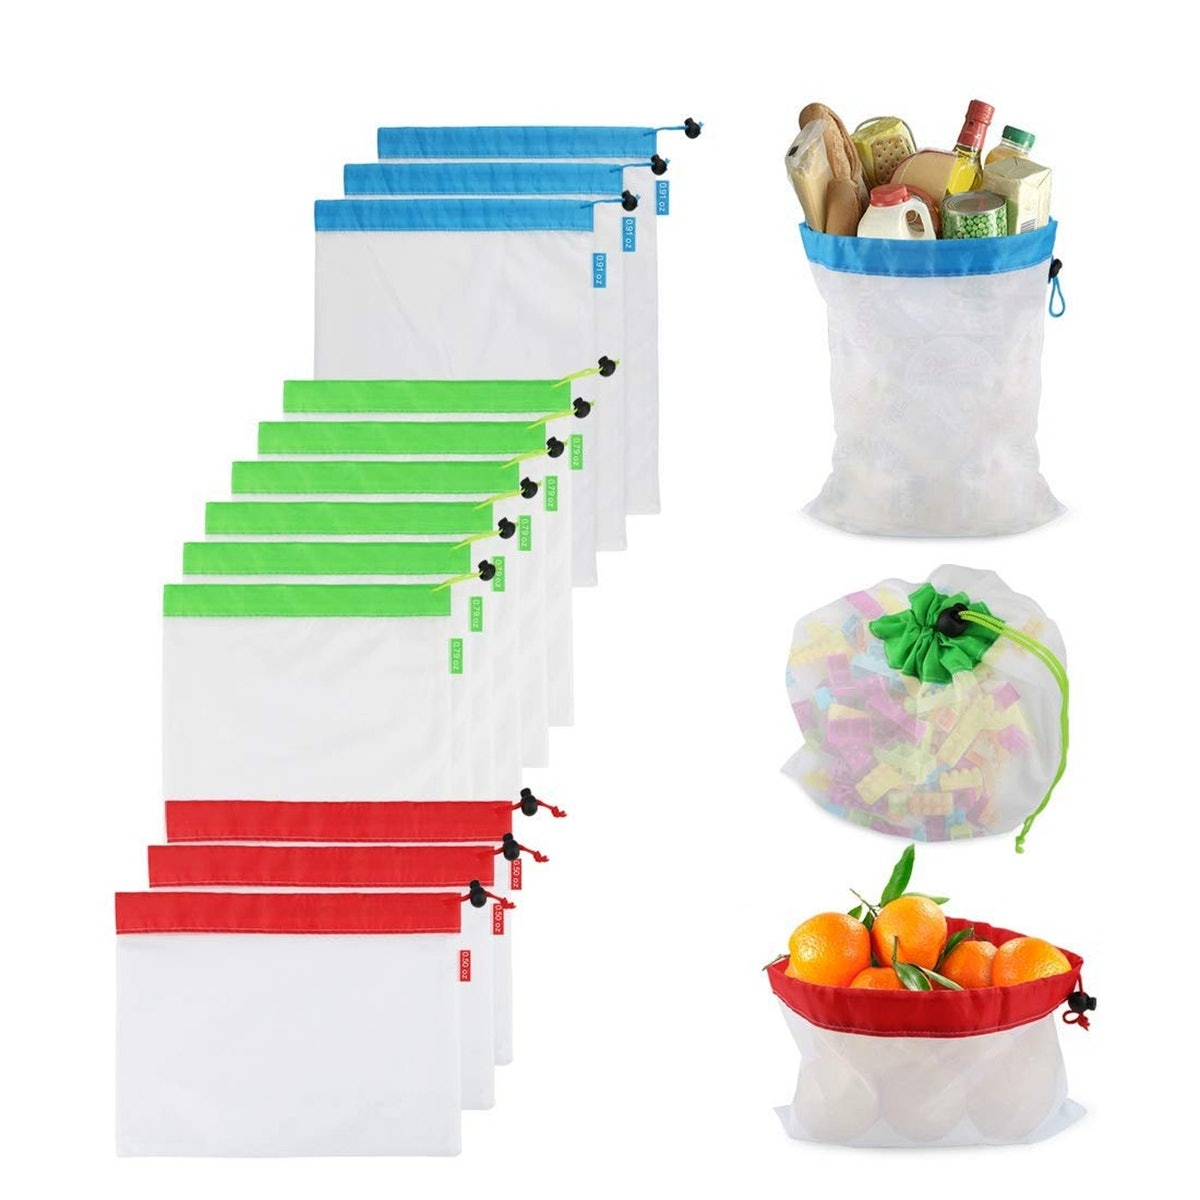 SMTFCO Reusable Produce Bags (12-Piece Set)